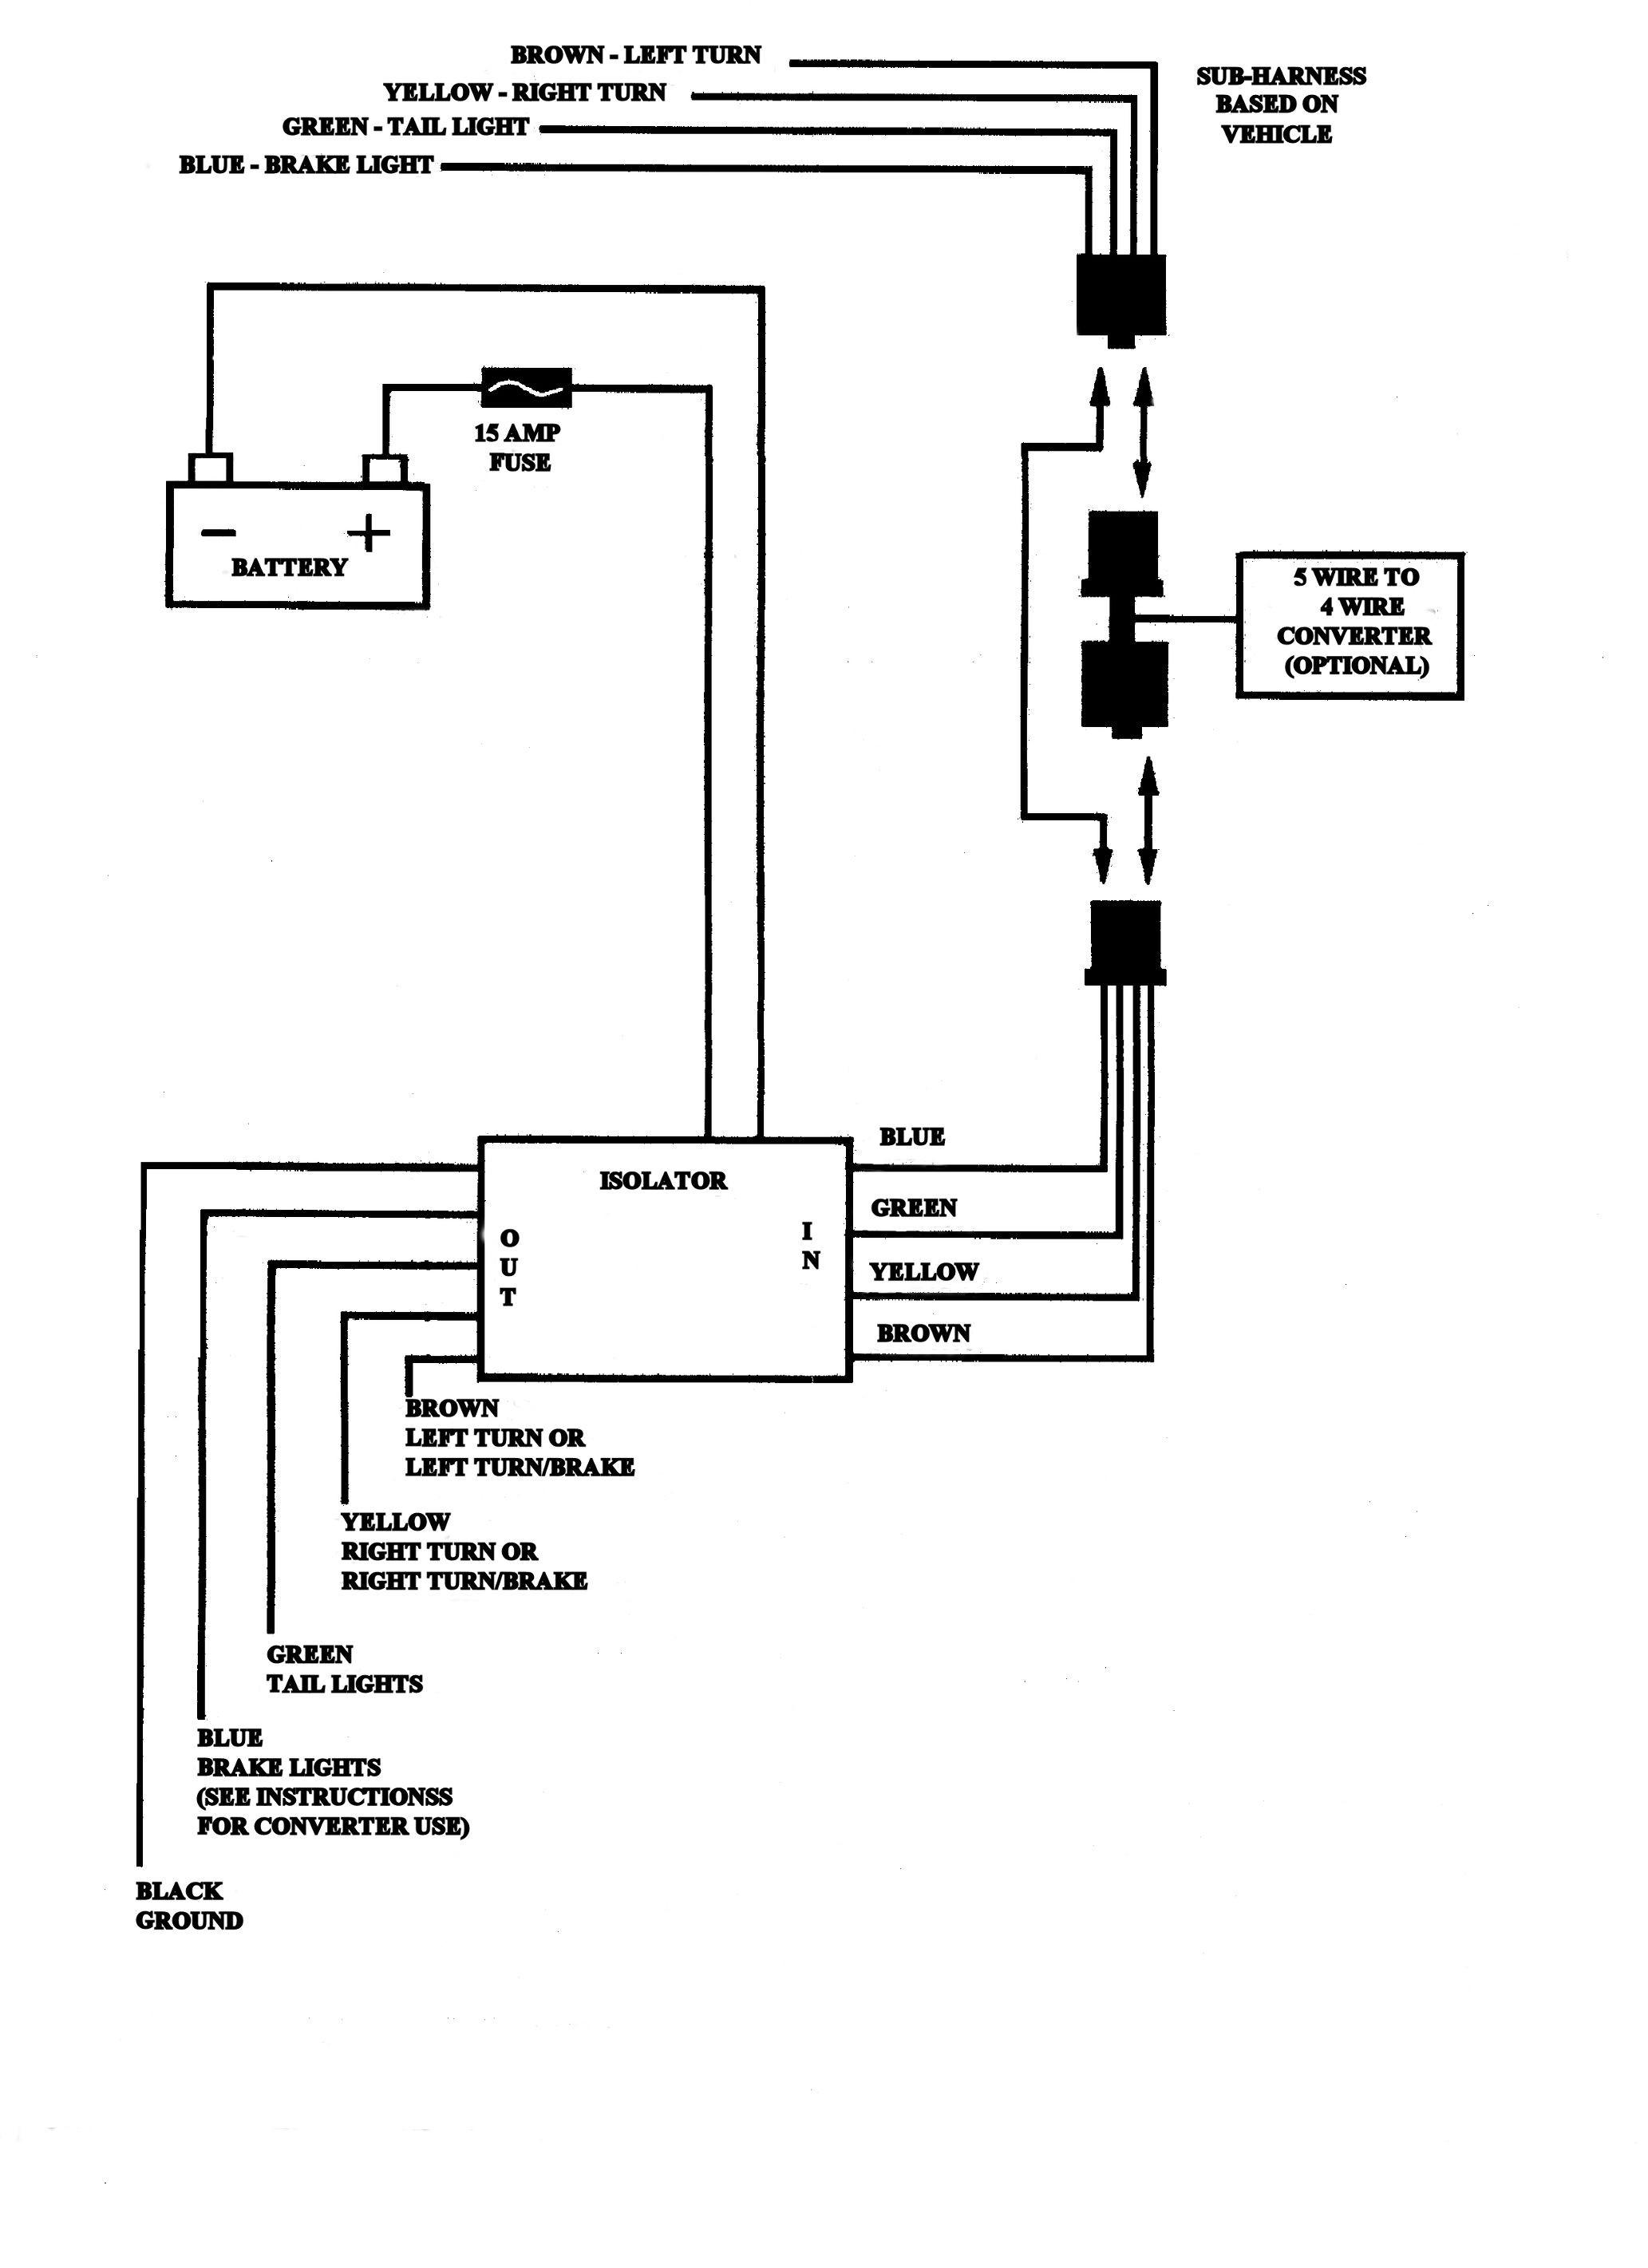 trailer wiring diagram wiring diagram image delta connection diagram molex wiring diagram thoritsolutions rh thoritsolutions yamaha road star